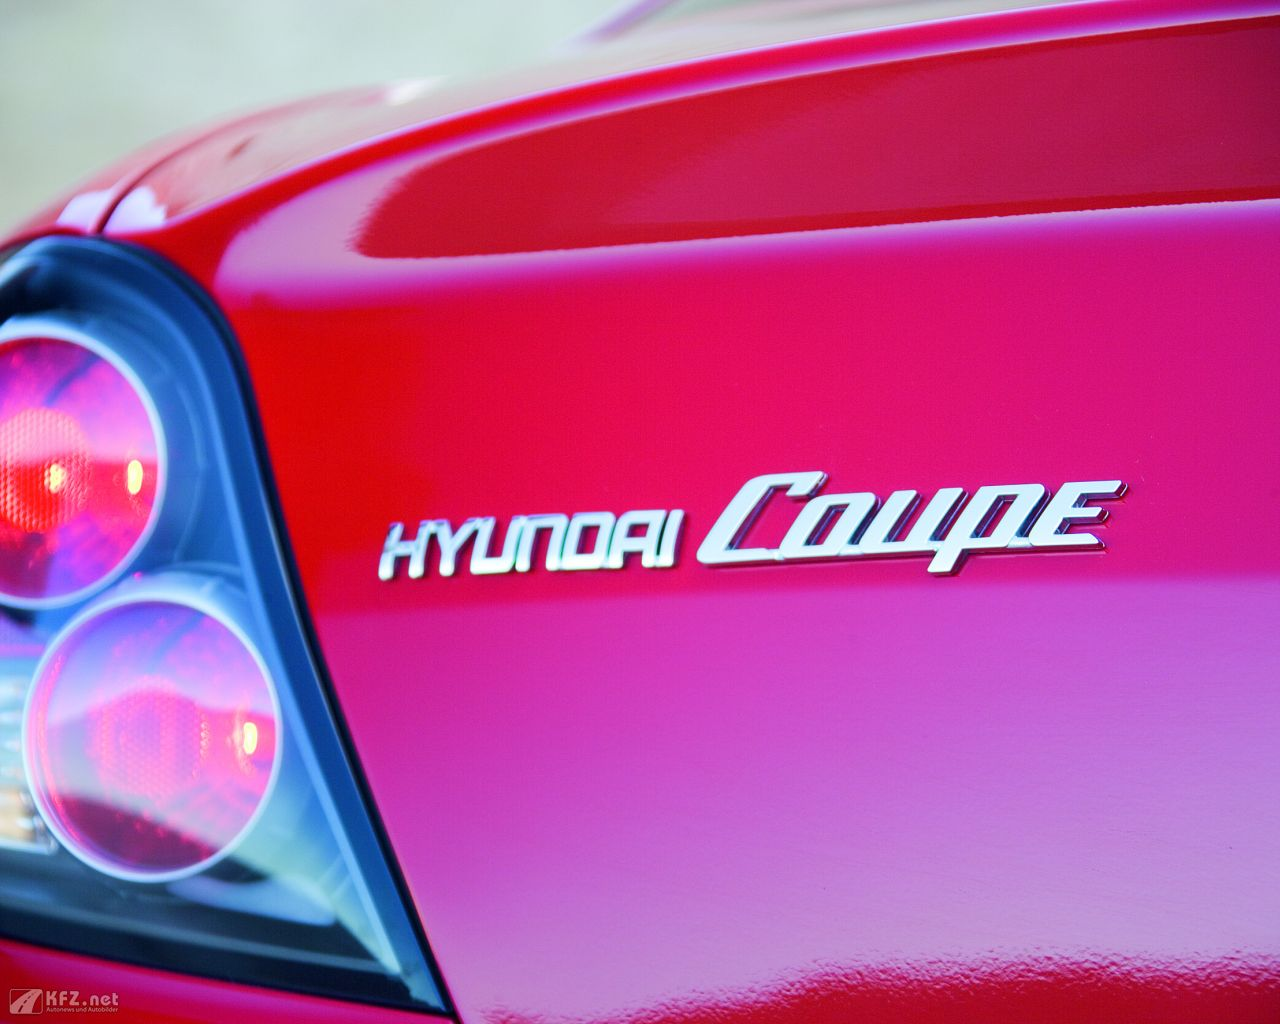 hyundai-coupe-1280x1024-181